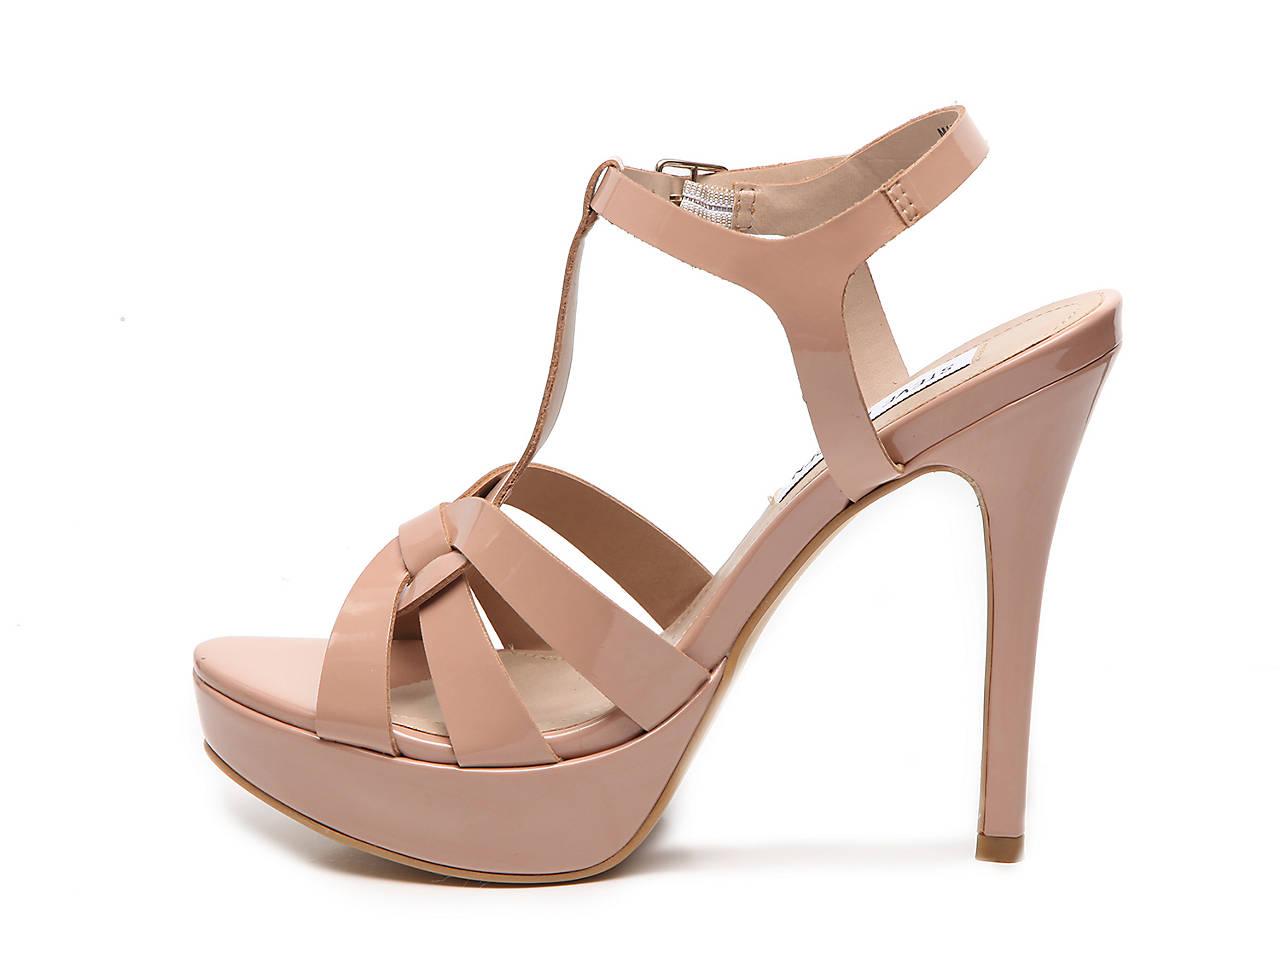 9f5c62c1c40 Steve Madden Kadri Platform Sandal Women s Shoes